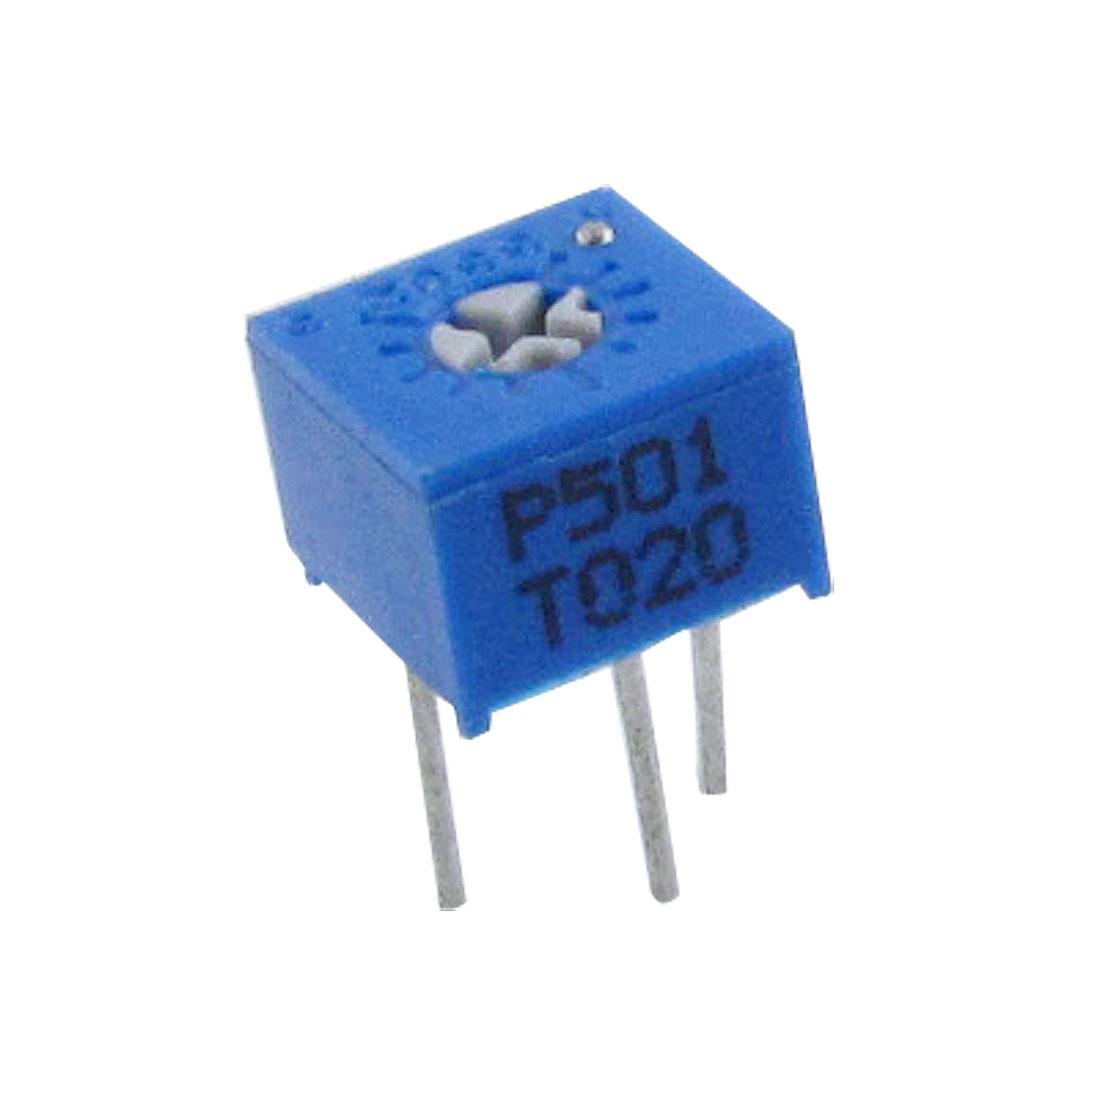 50 Pcs 3362P-1-501 1/2W 500 Ohm Single Turn Trimmer Potentiometer